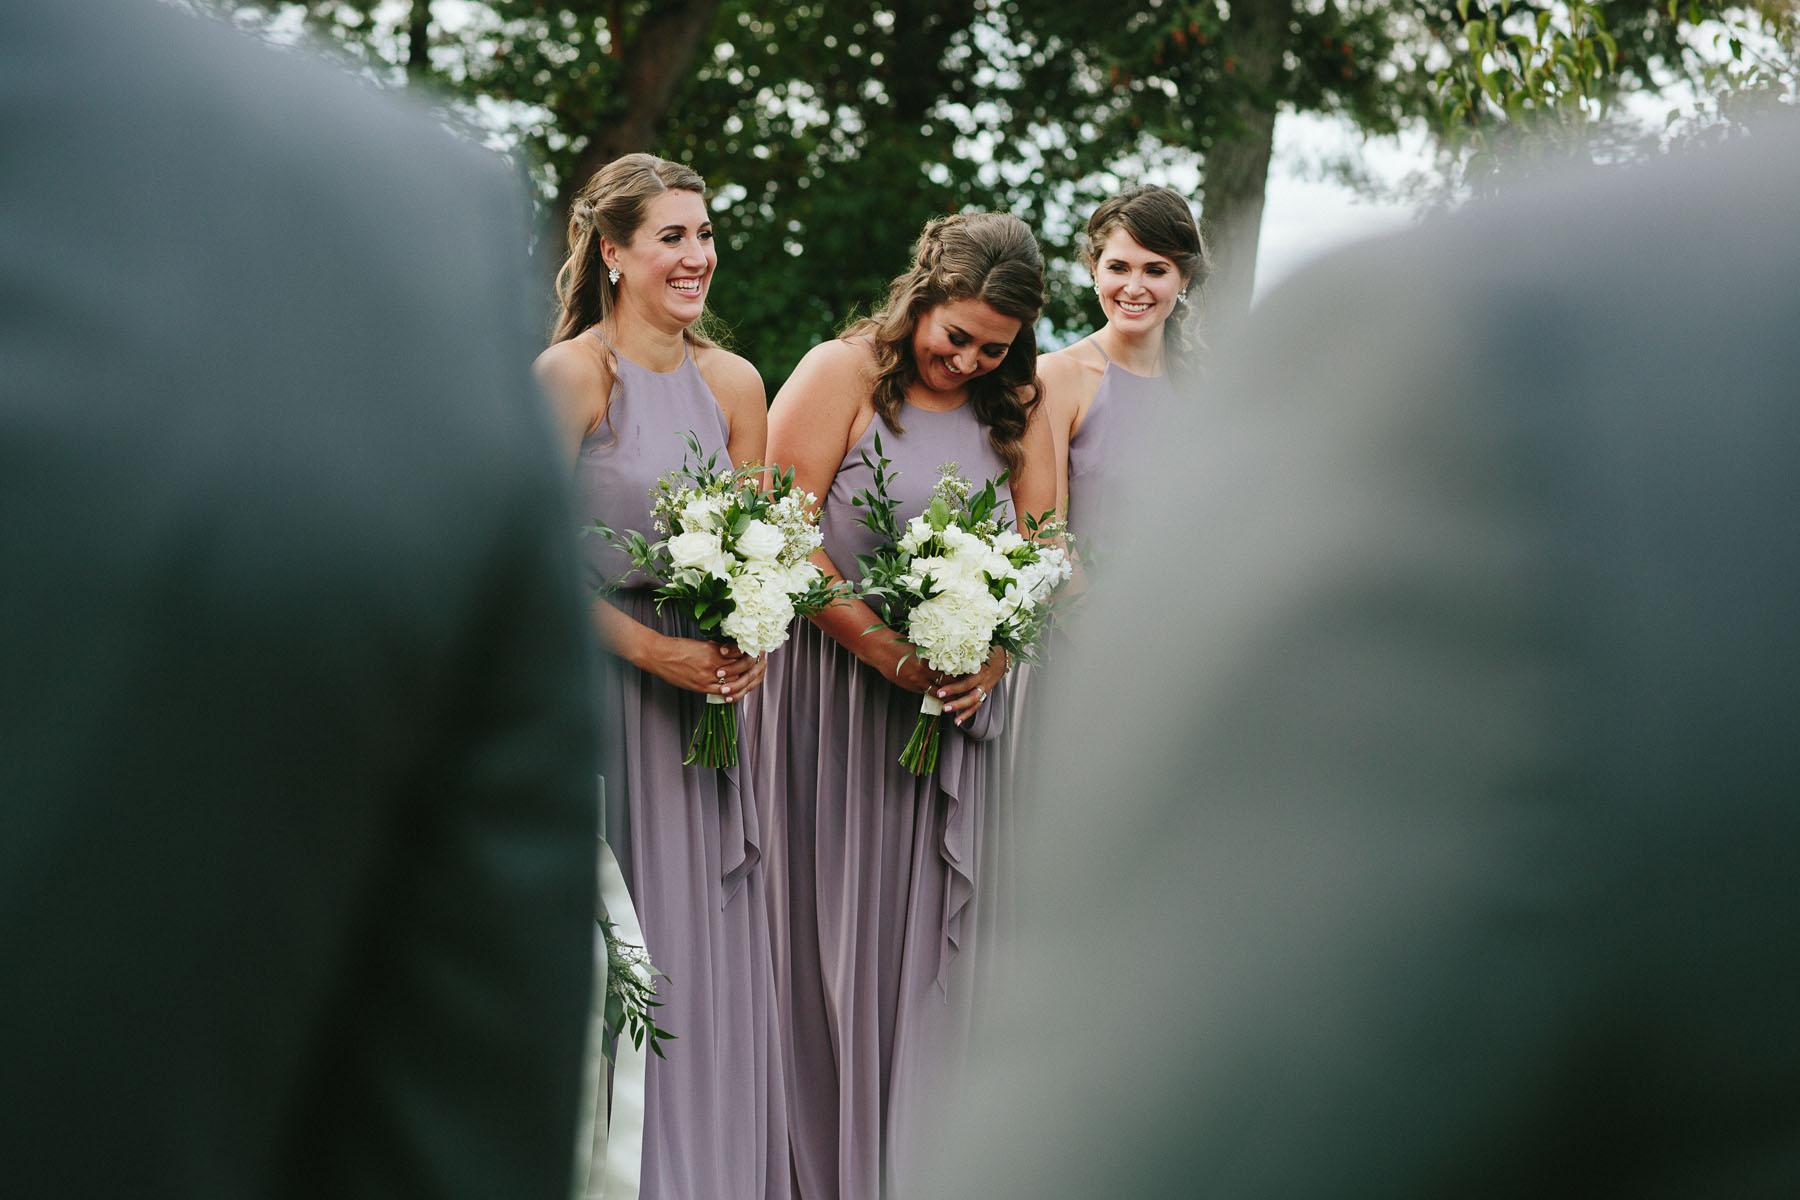 thetis-island-wedding-photographer-rp-rn-094.jpg